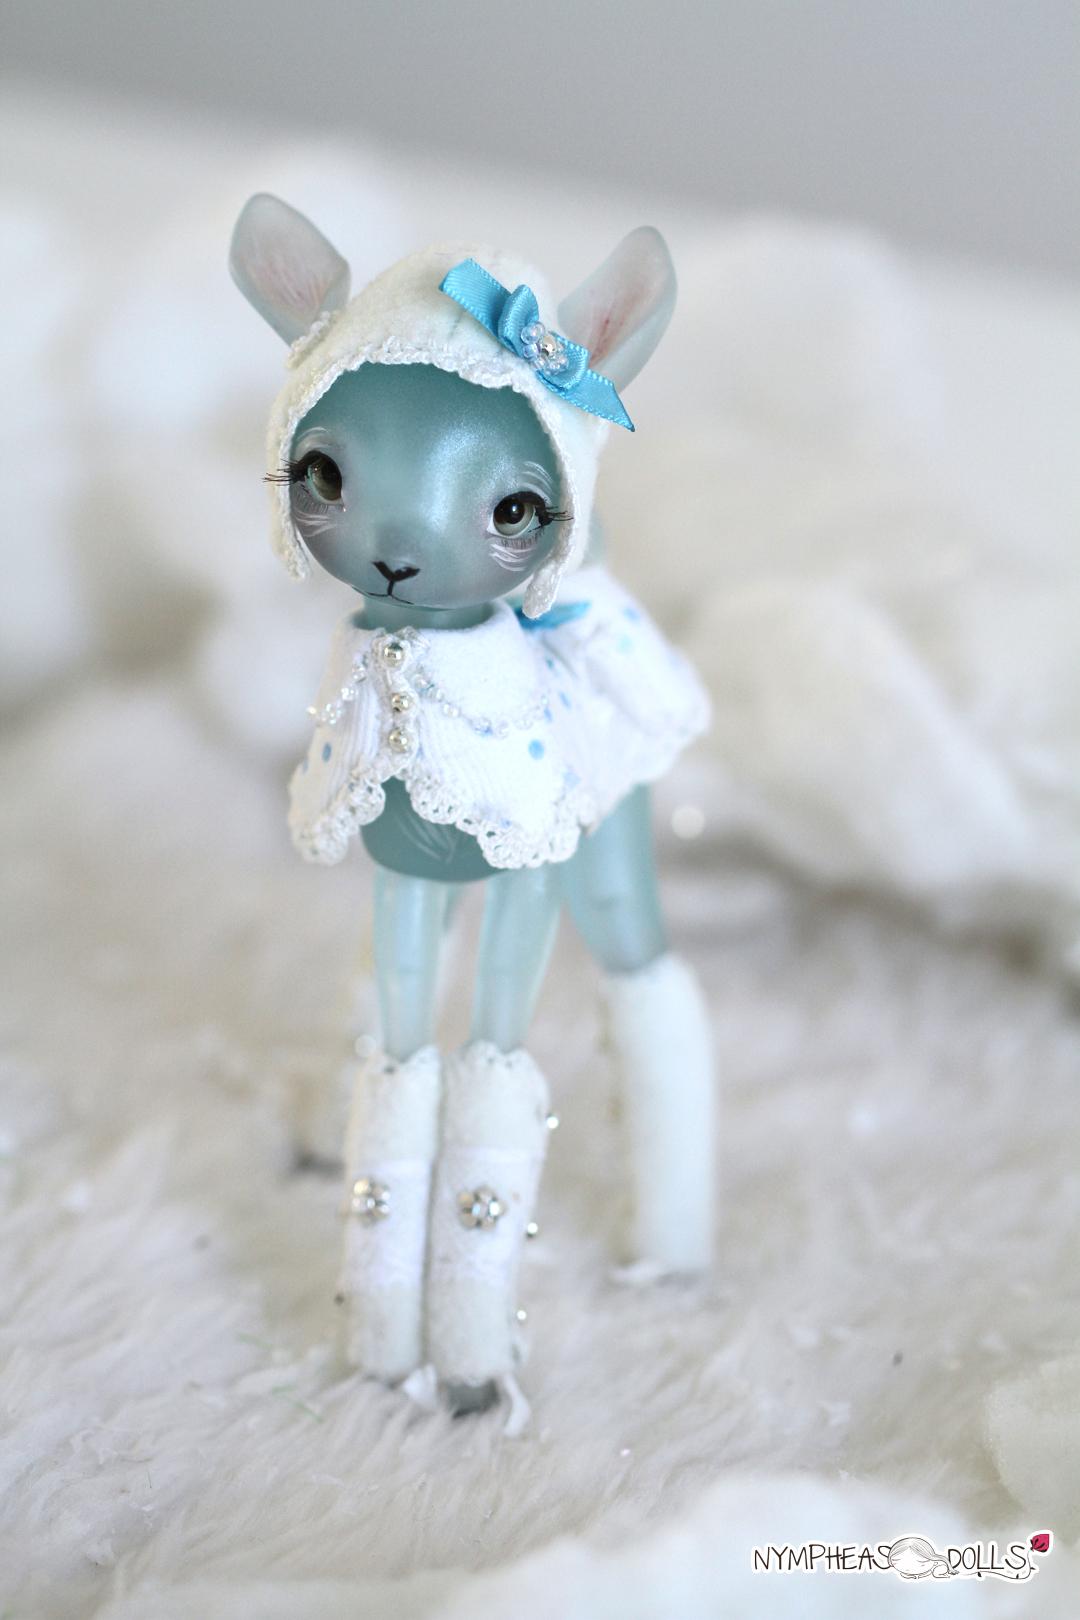 [Nympheas dolls]Mini Mûshika p3 - Page 3 FannyCrystal8